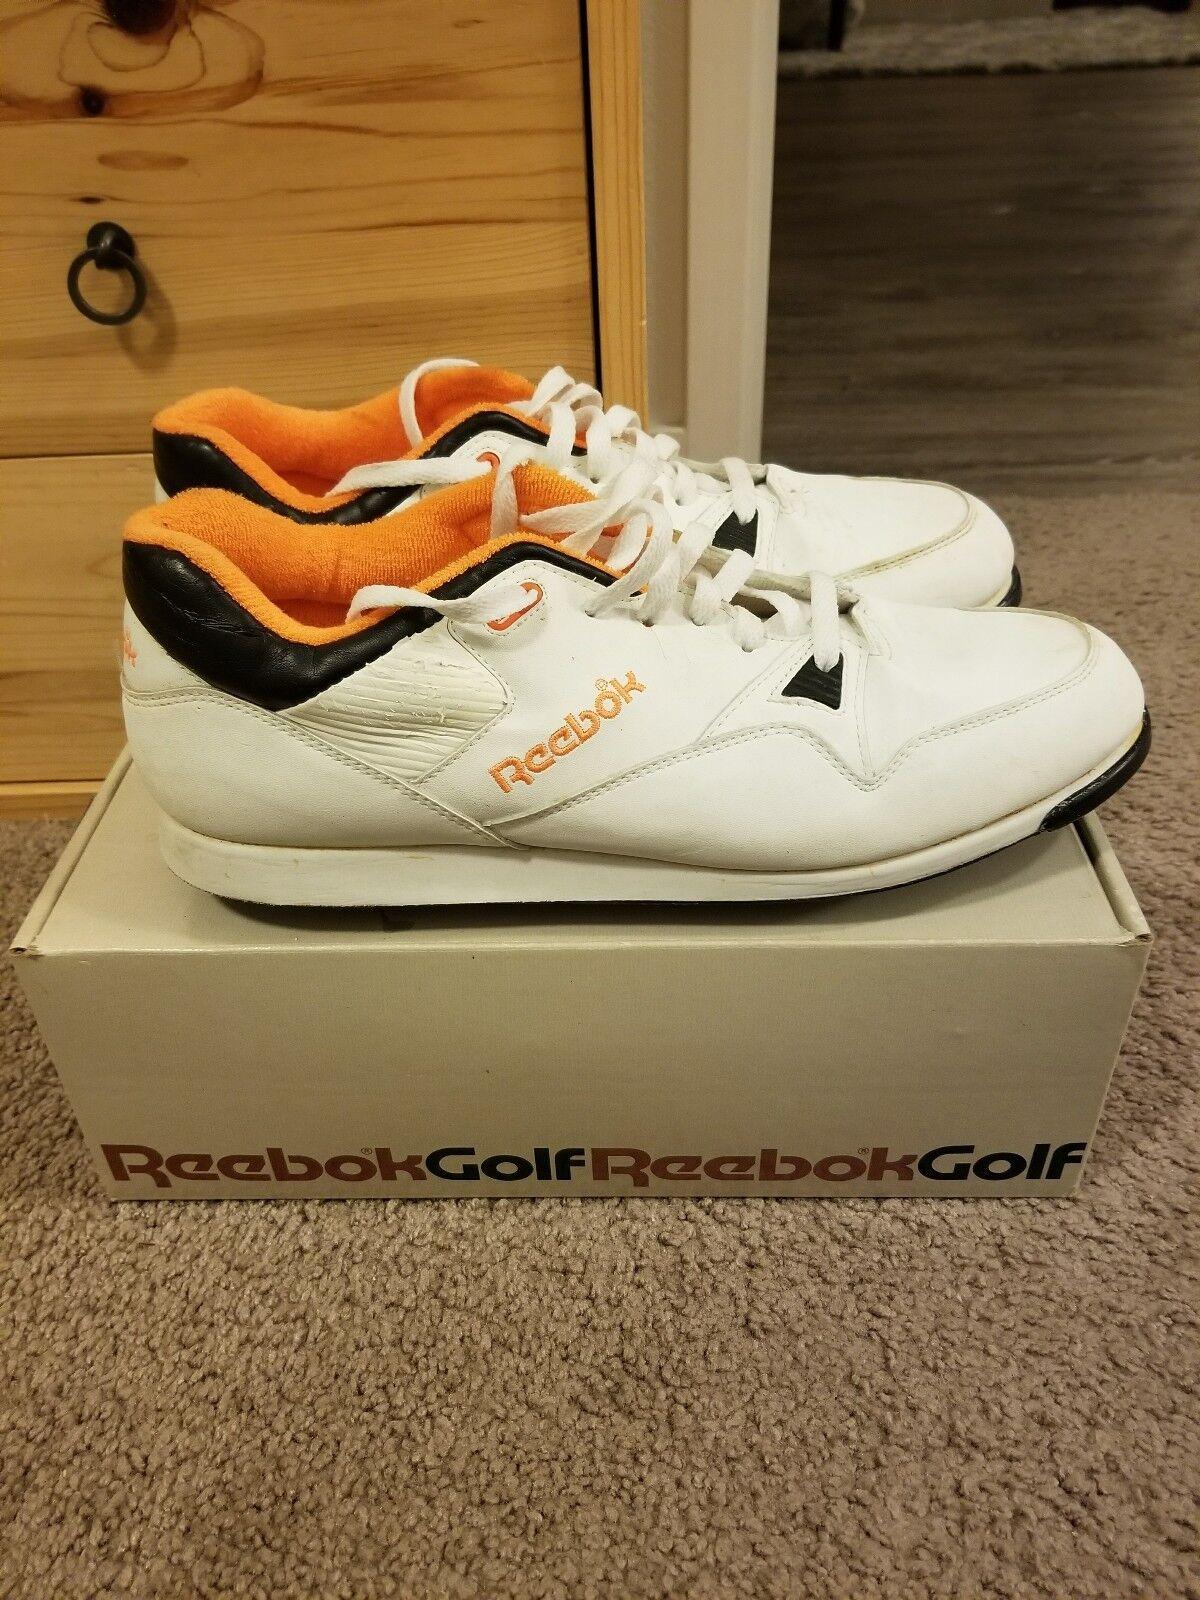 Vintage Shoes 1988 Reebok Vitality Golf Shoes Vintage Uomo's Sz. 13M 99b92a